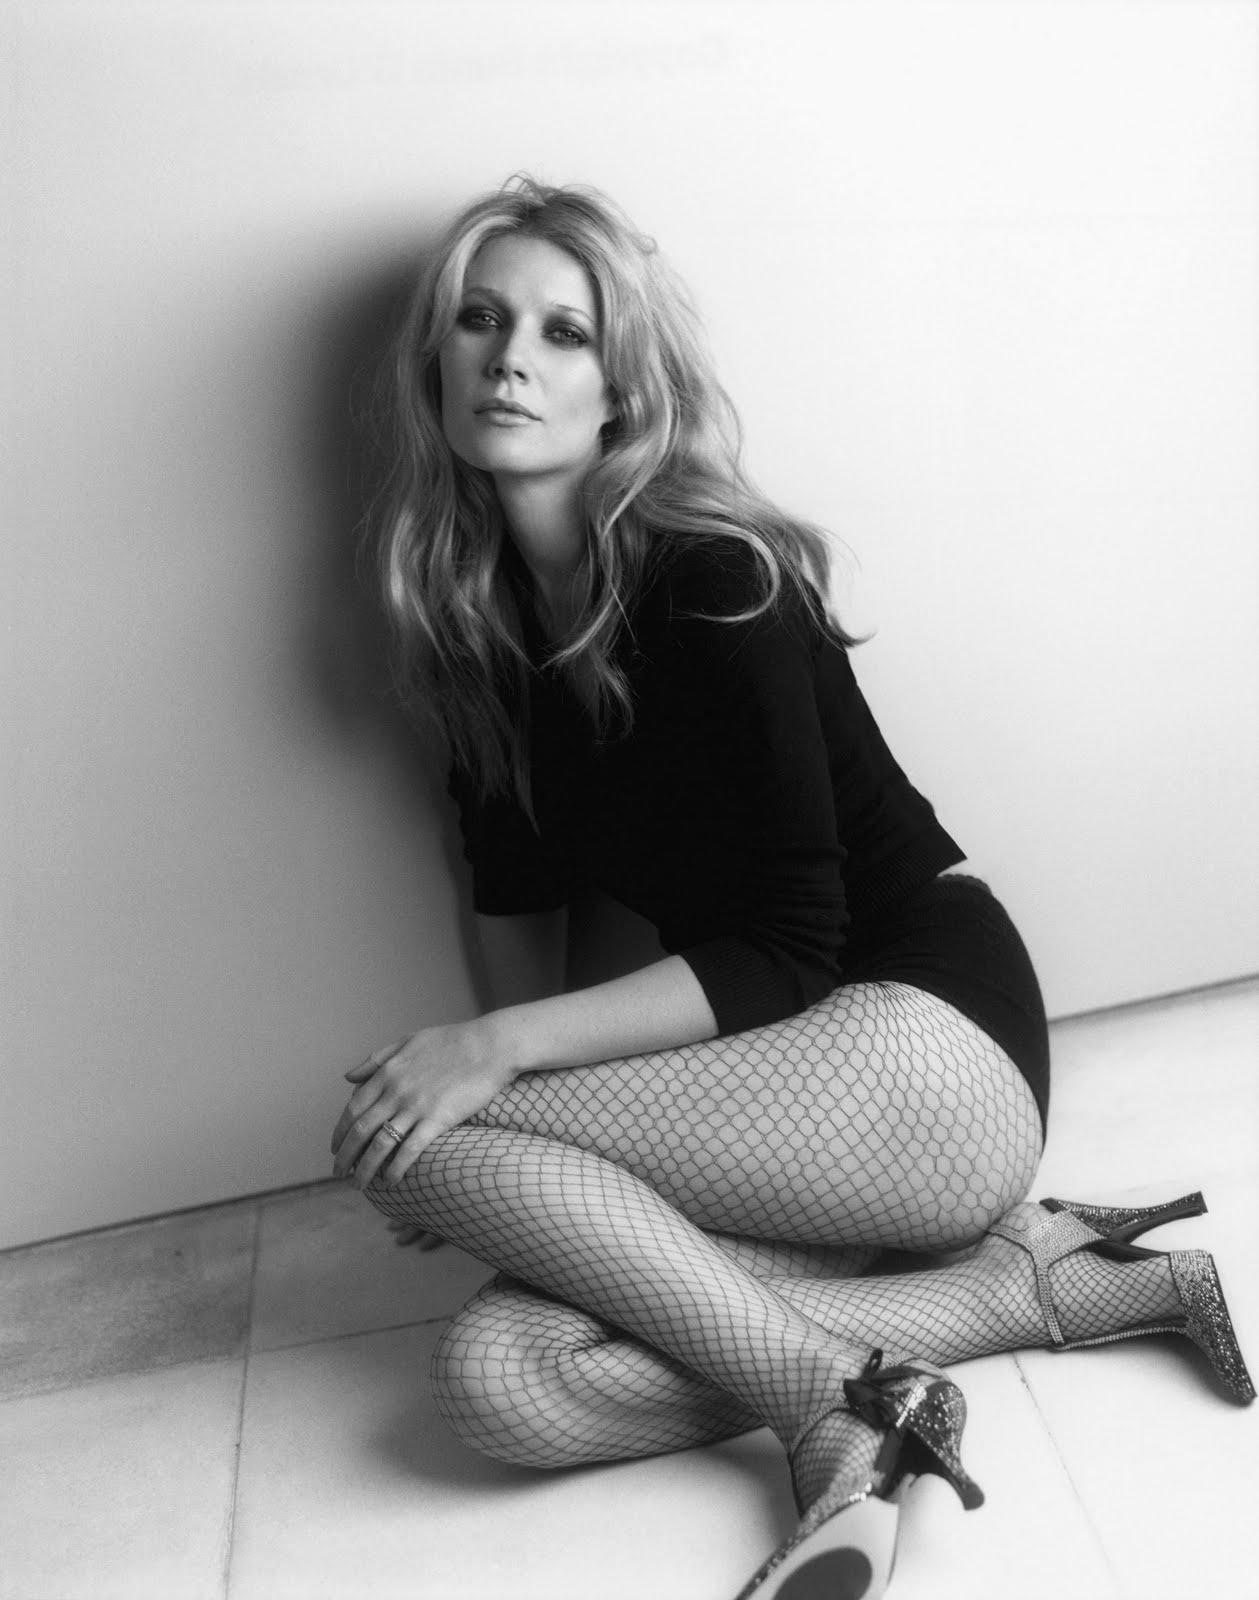 http://3.bp.blogspot.com/-2JHczCGaL8E/Tcp1k8meDqI/AAAAAAAABeI/agEWeyYmpsw/s1600/gwyneth-paltrow-gq-05.jpg